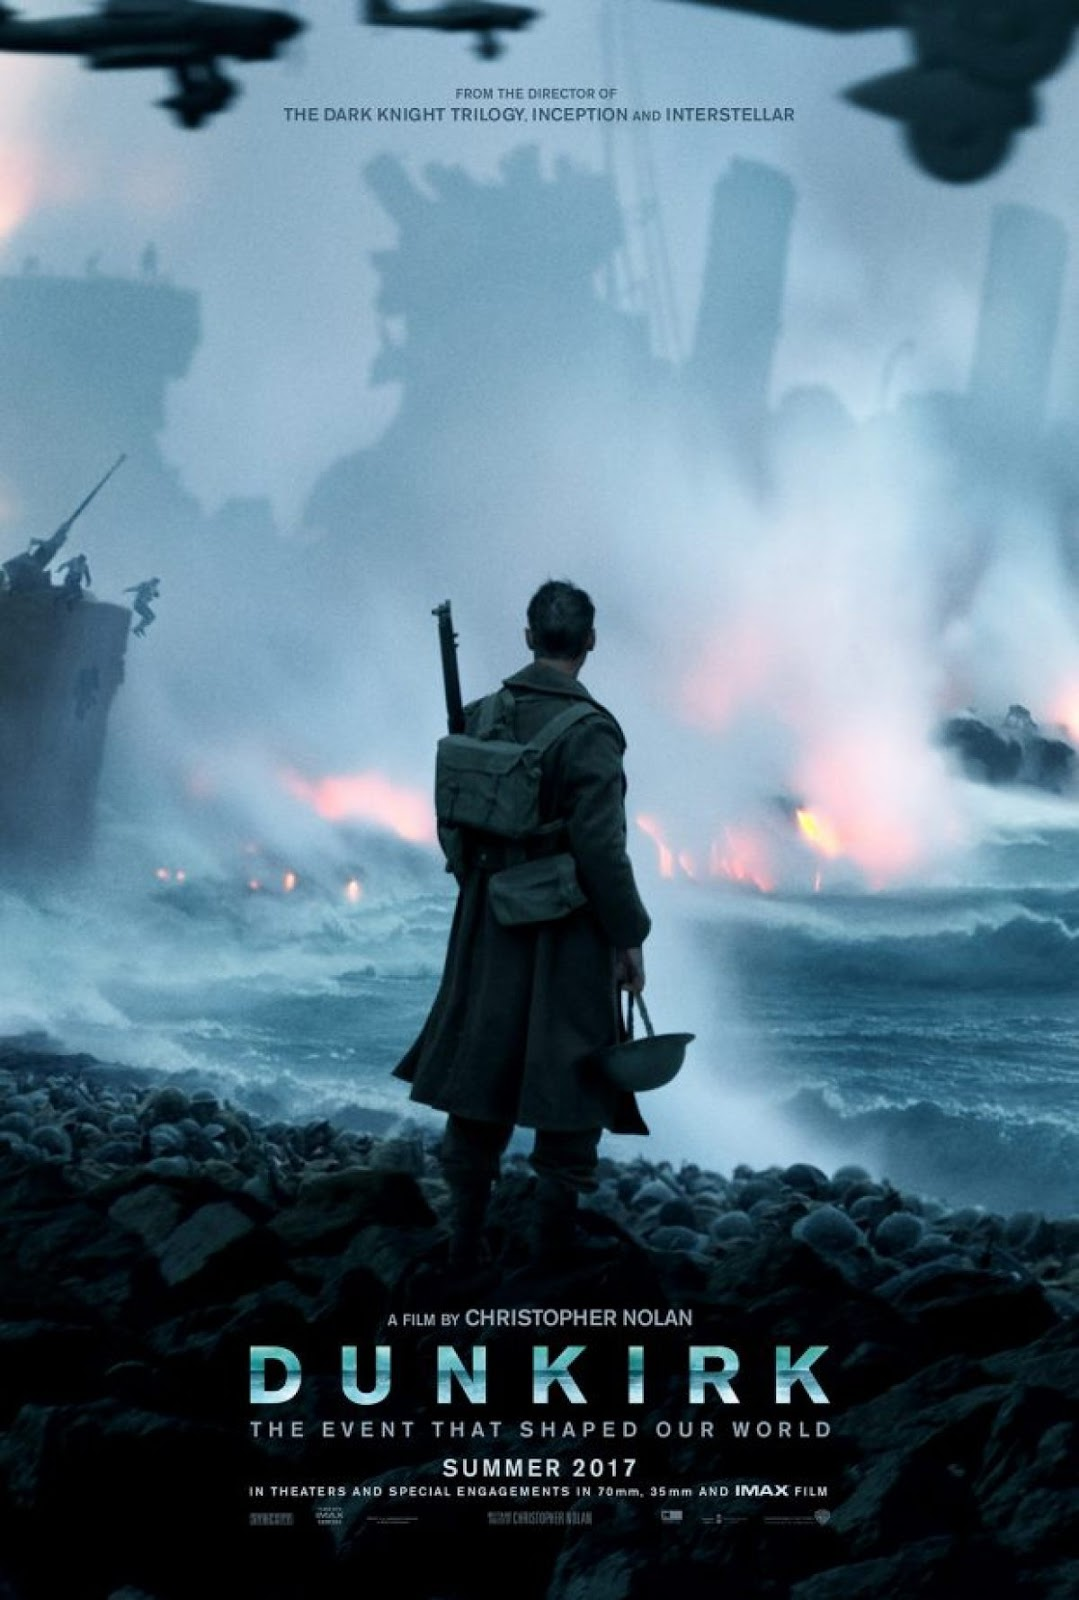 Capa Dunkirk Torrent Dublado 720p 1080p 5.1 Baixar